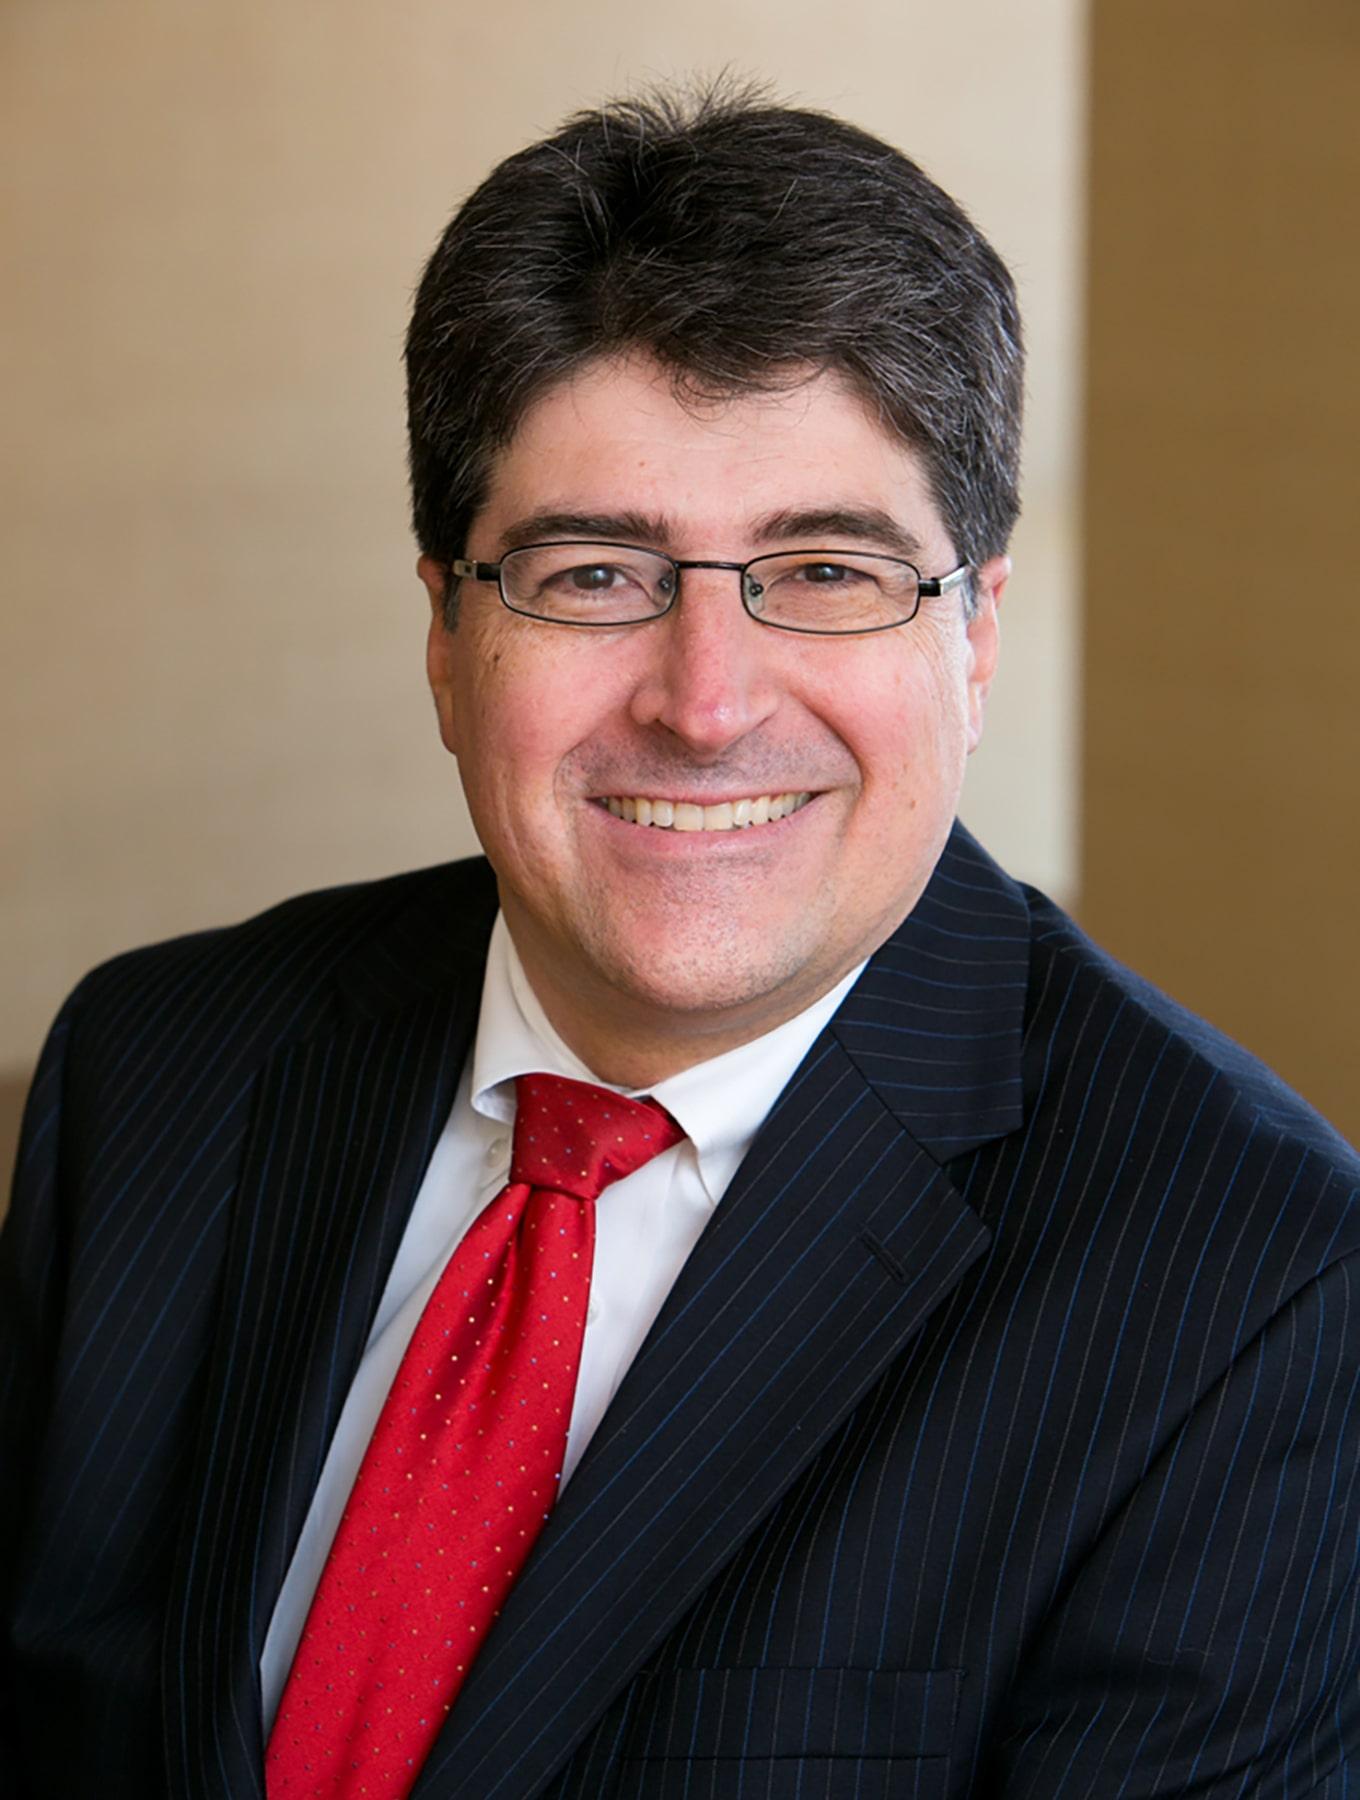 Patrick A. Bittner, CFA